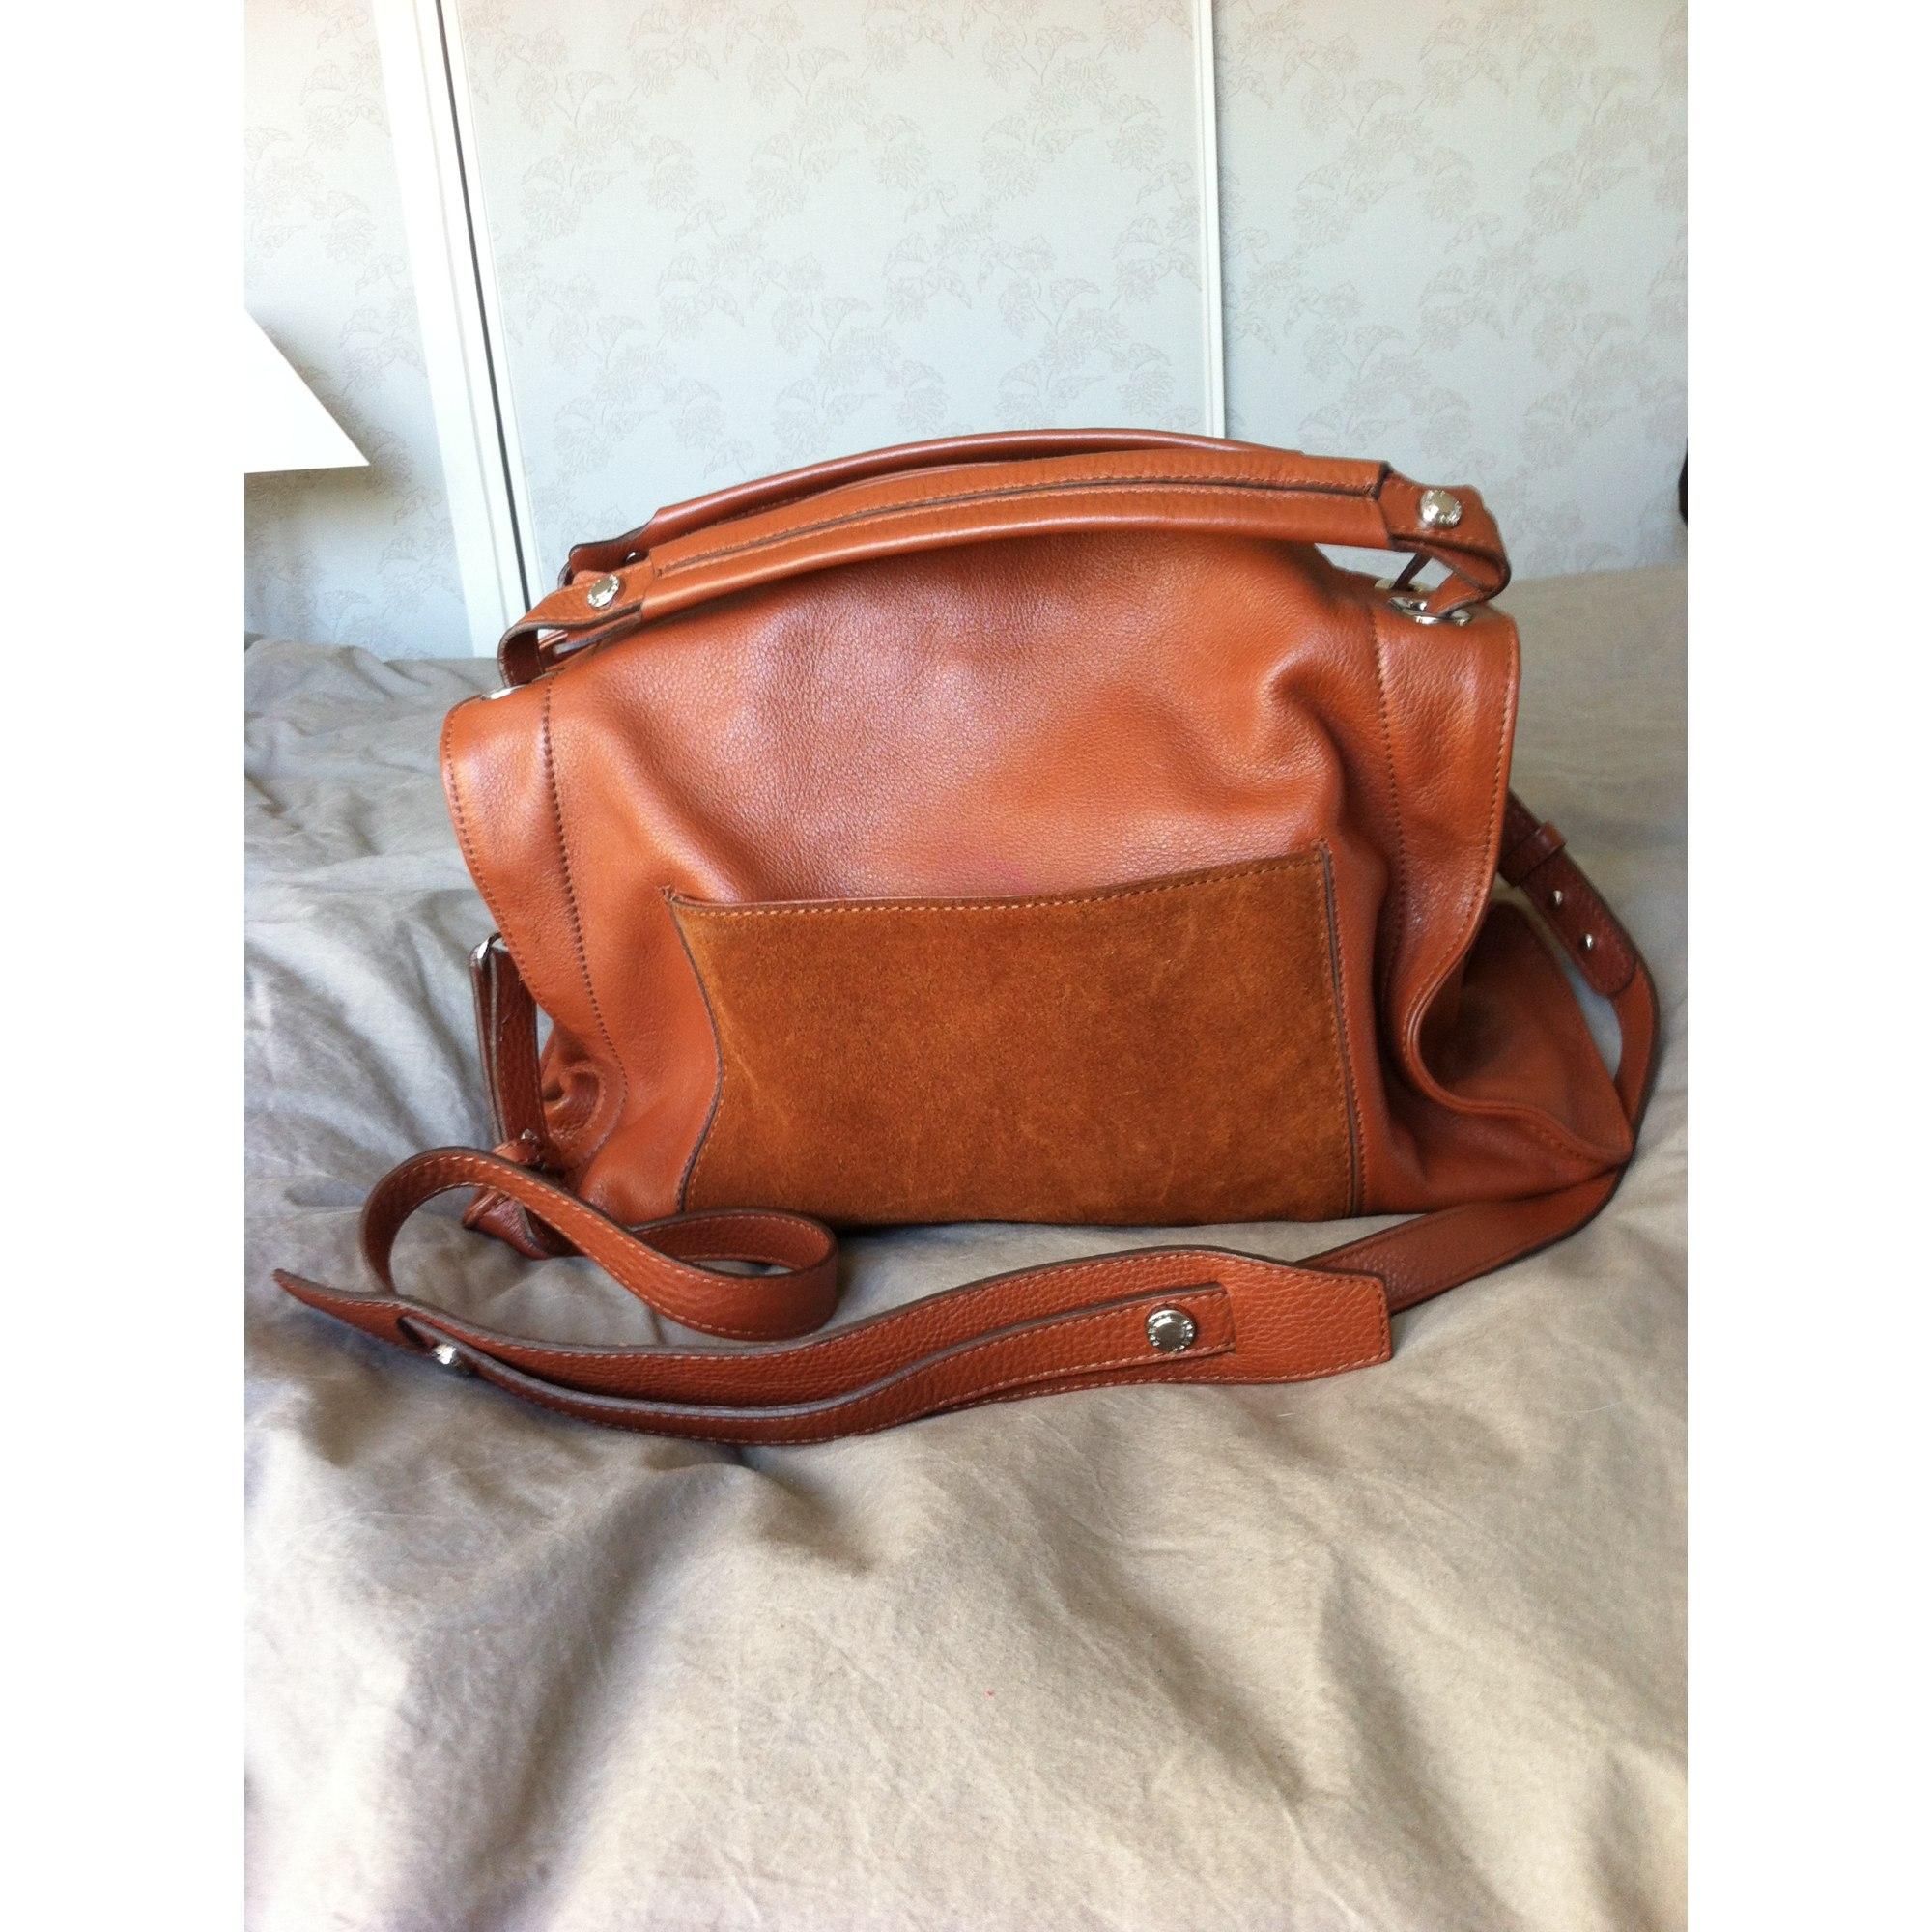 Sac en bandoulière en cuir SANDRO marron vendu par Loca chica - 7666506 f7bcb47dfff